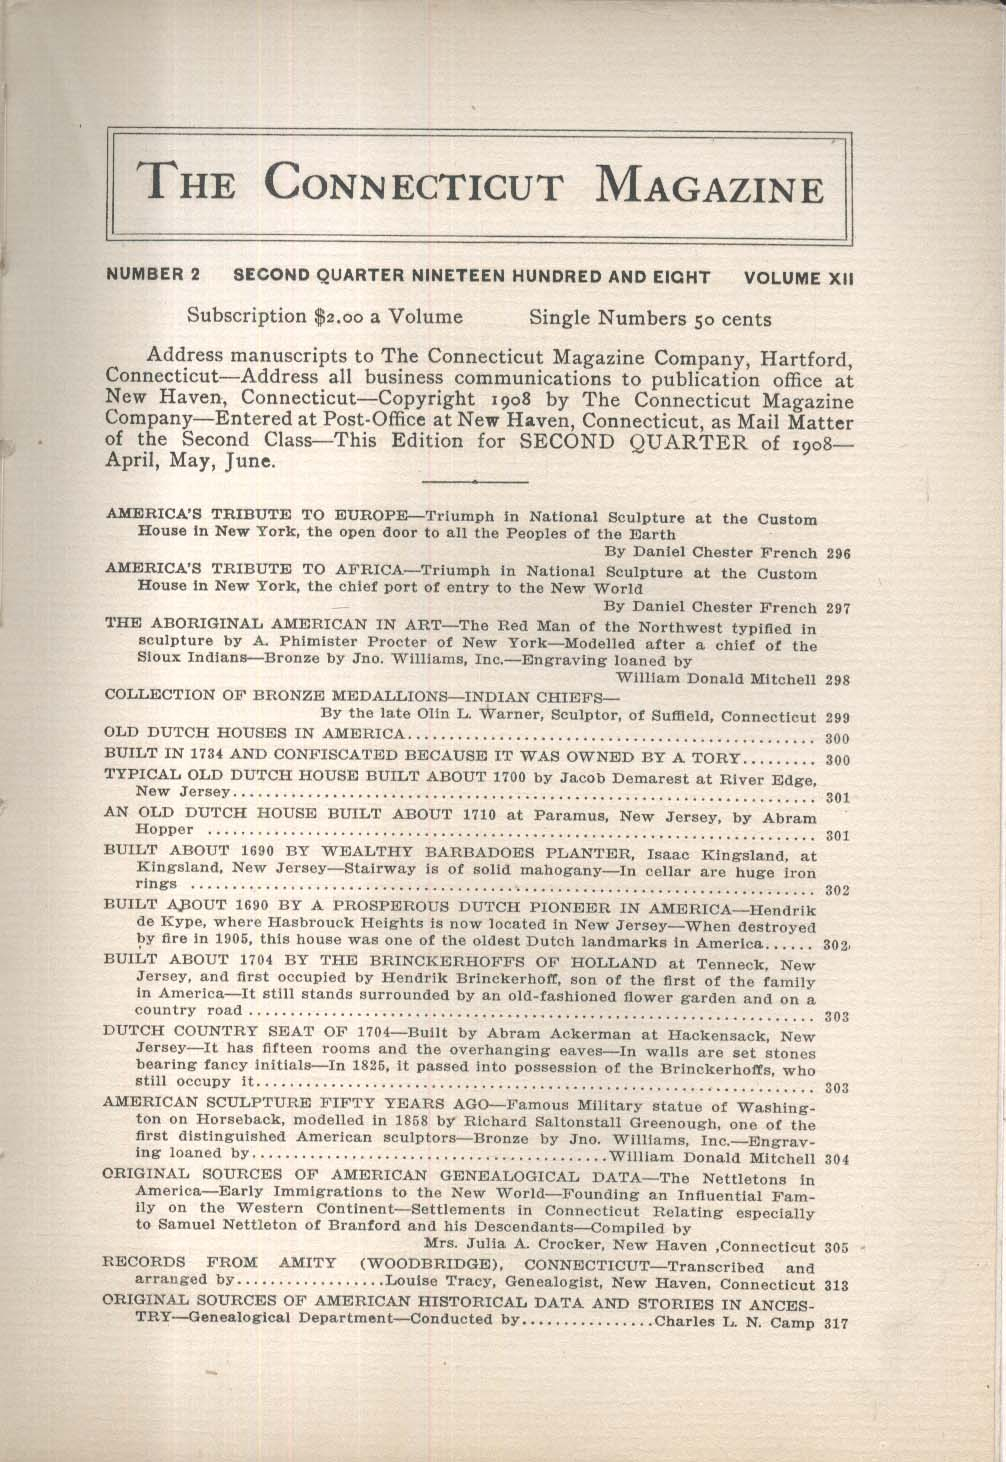 CONNECTICUT MAGAZINE Theodore Roosevelt Prudence Crandall Samuel Kirkland + 1908